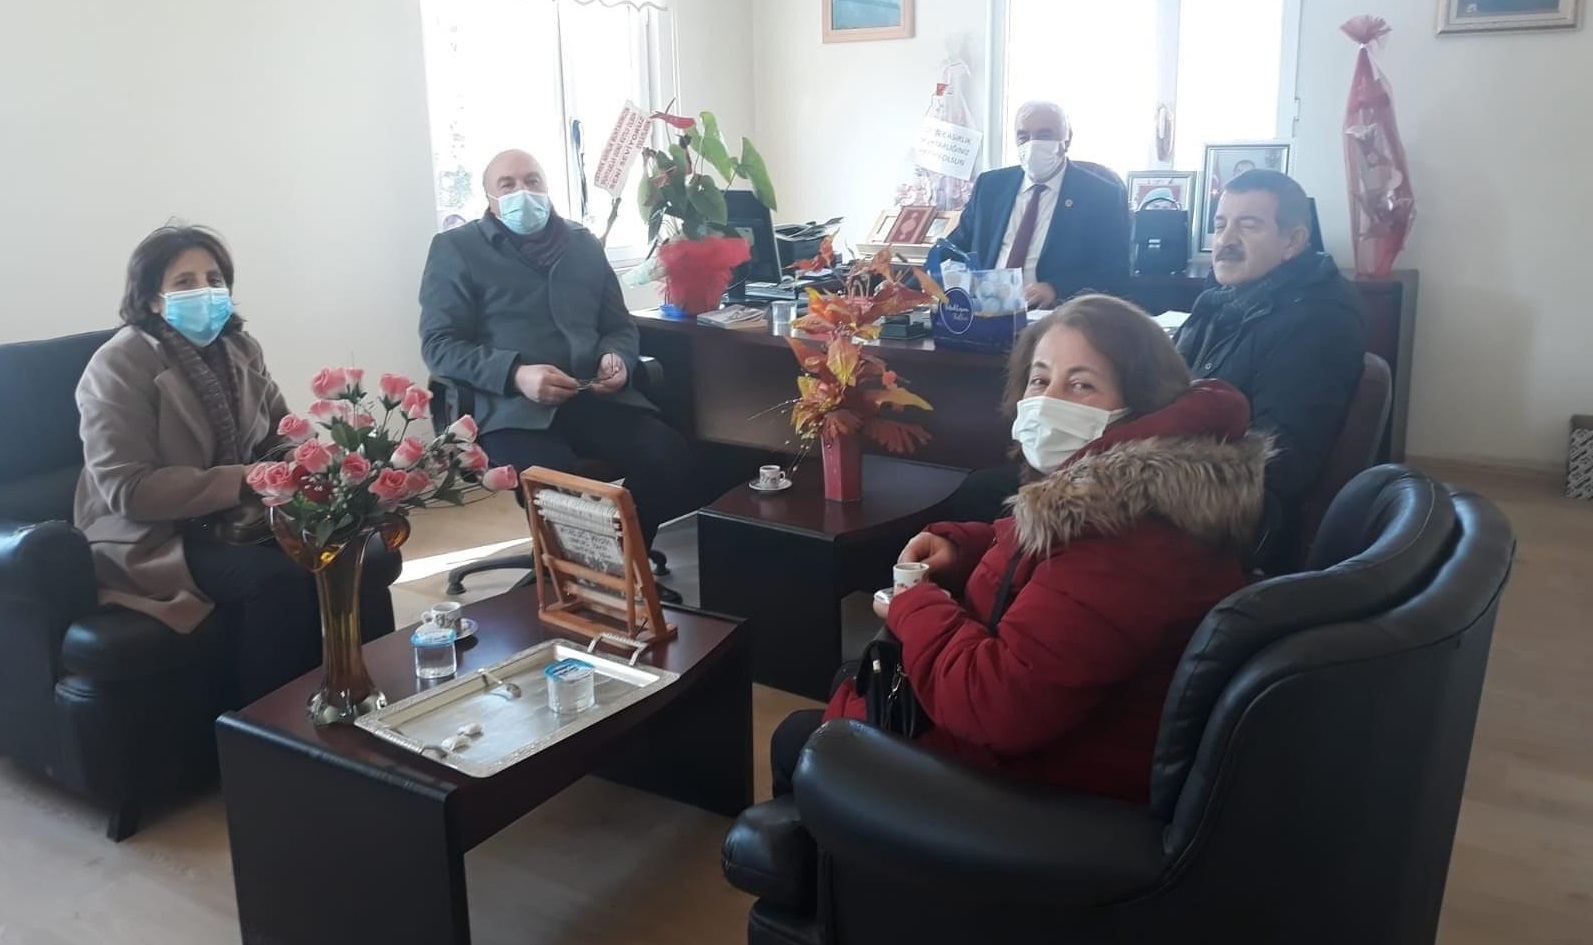 CHP MUHTARLARLA İSTİŞARE EDİYOR